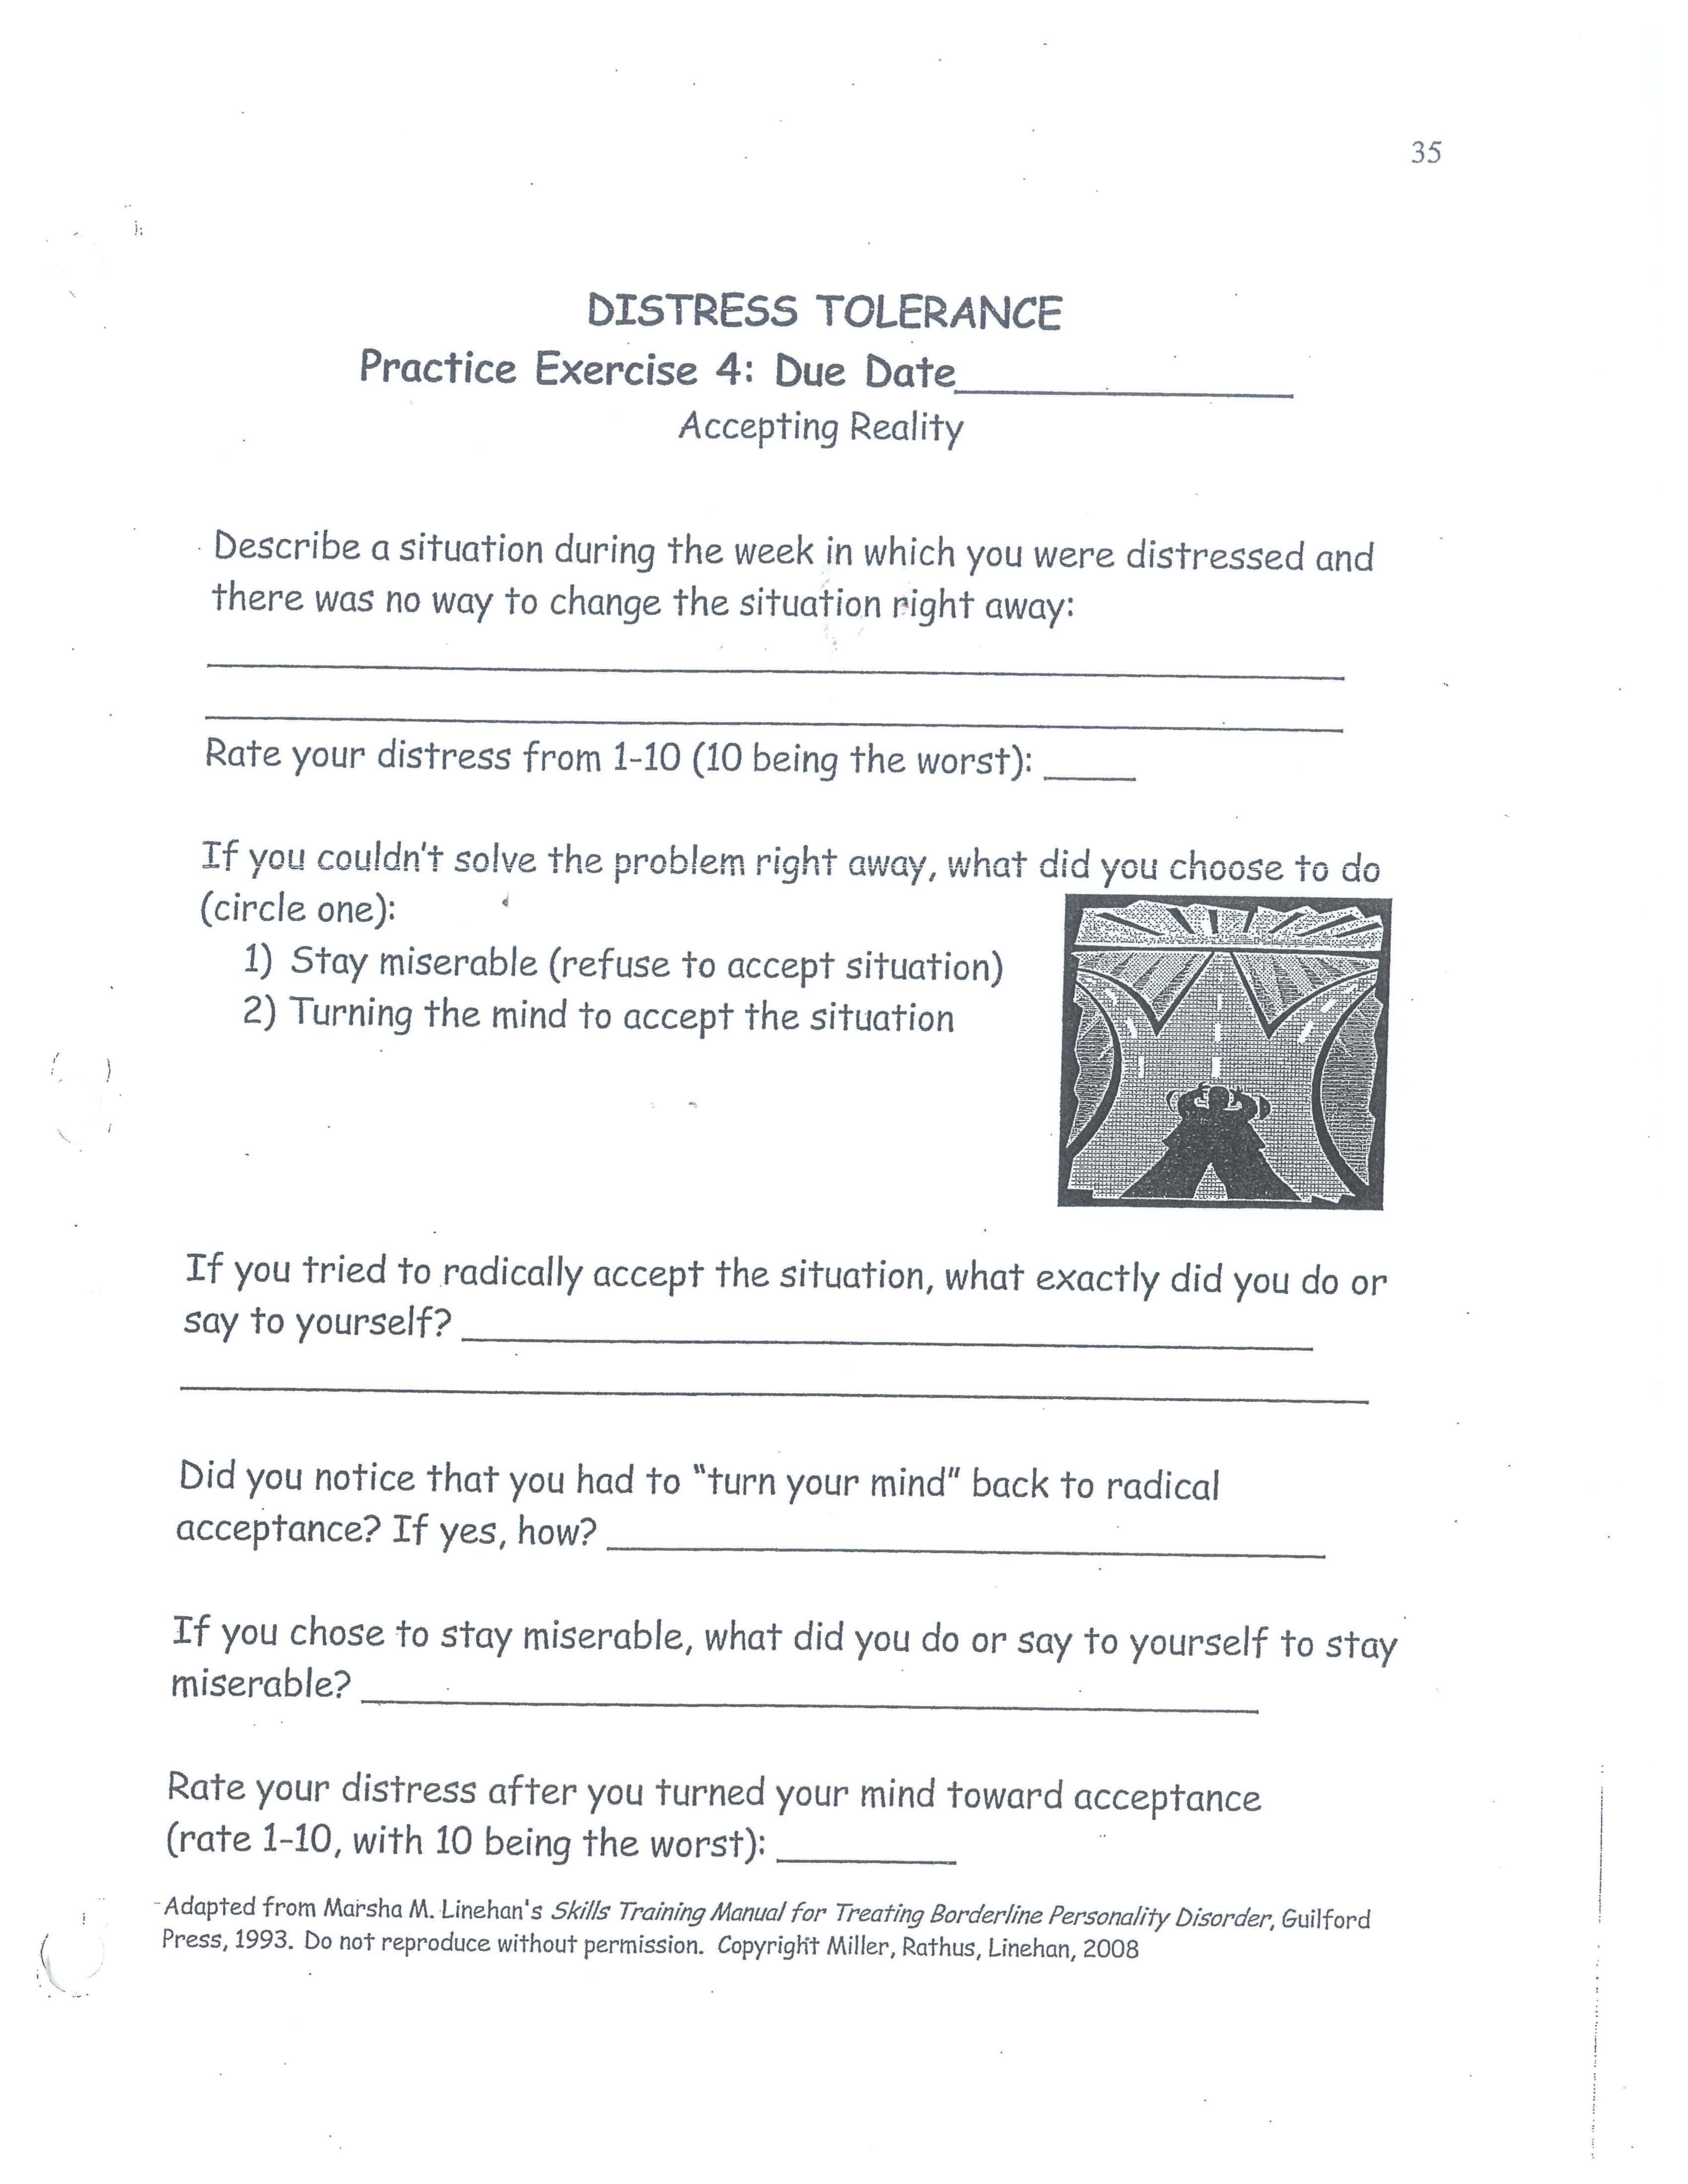 Dbt Distress Tolerance